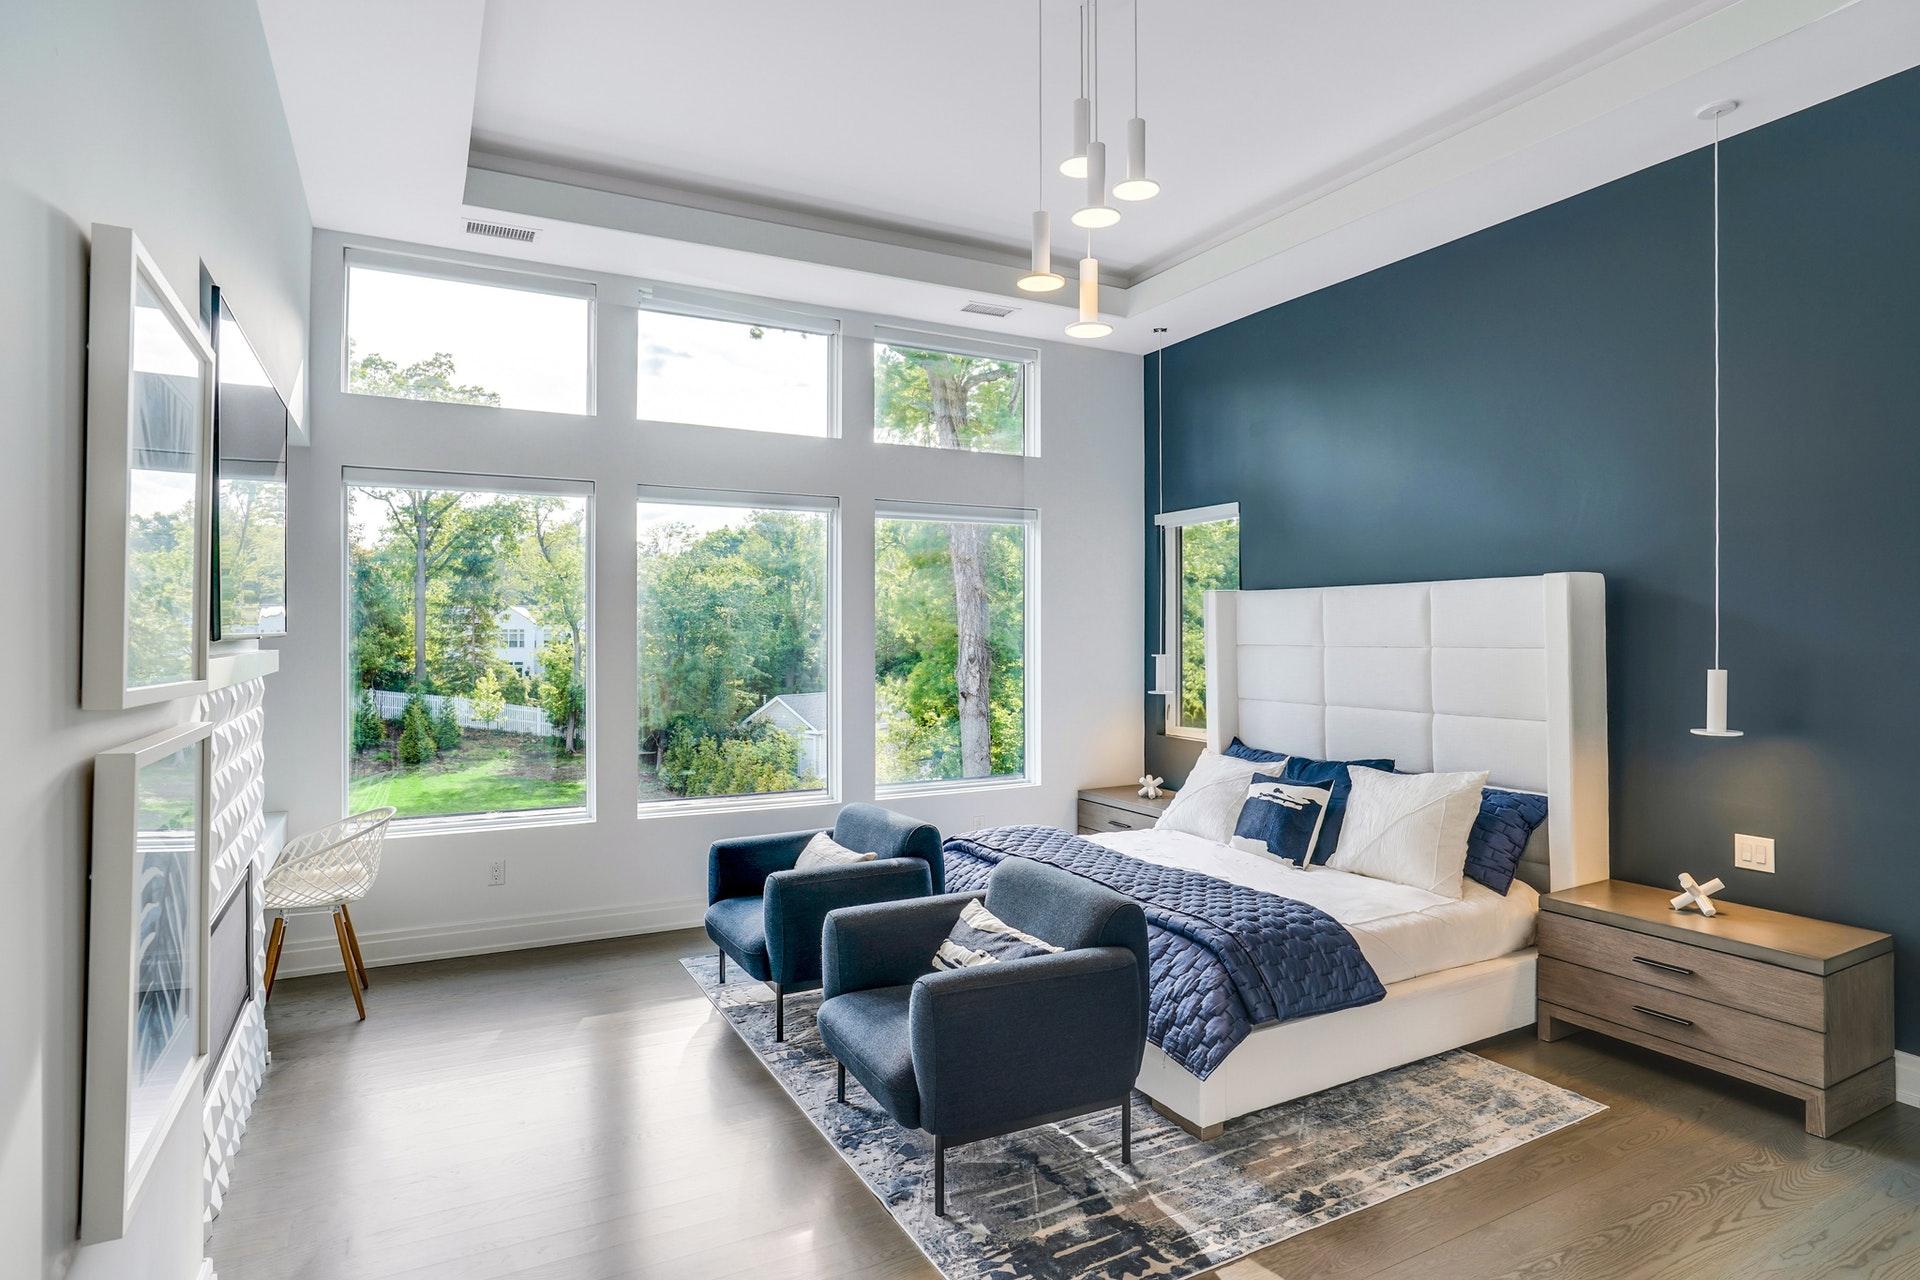 171 Highland Avenue Master Bedroom